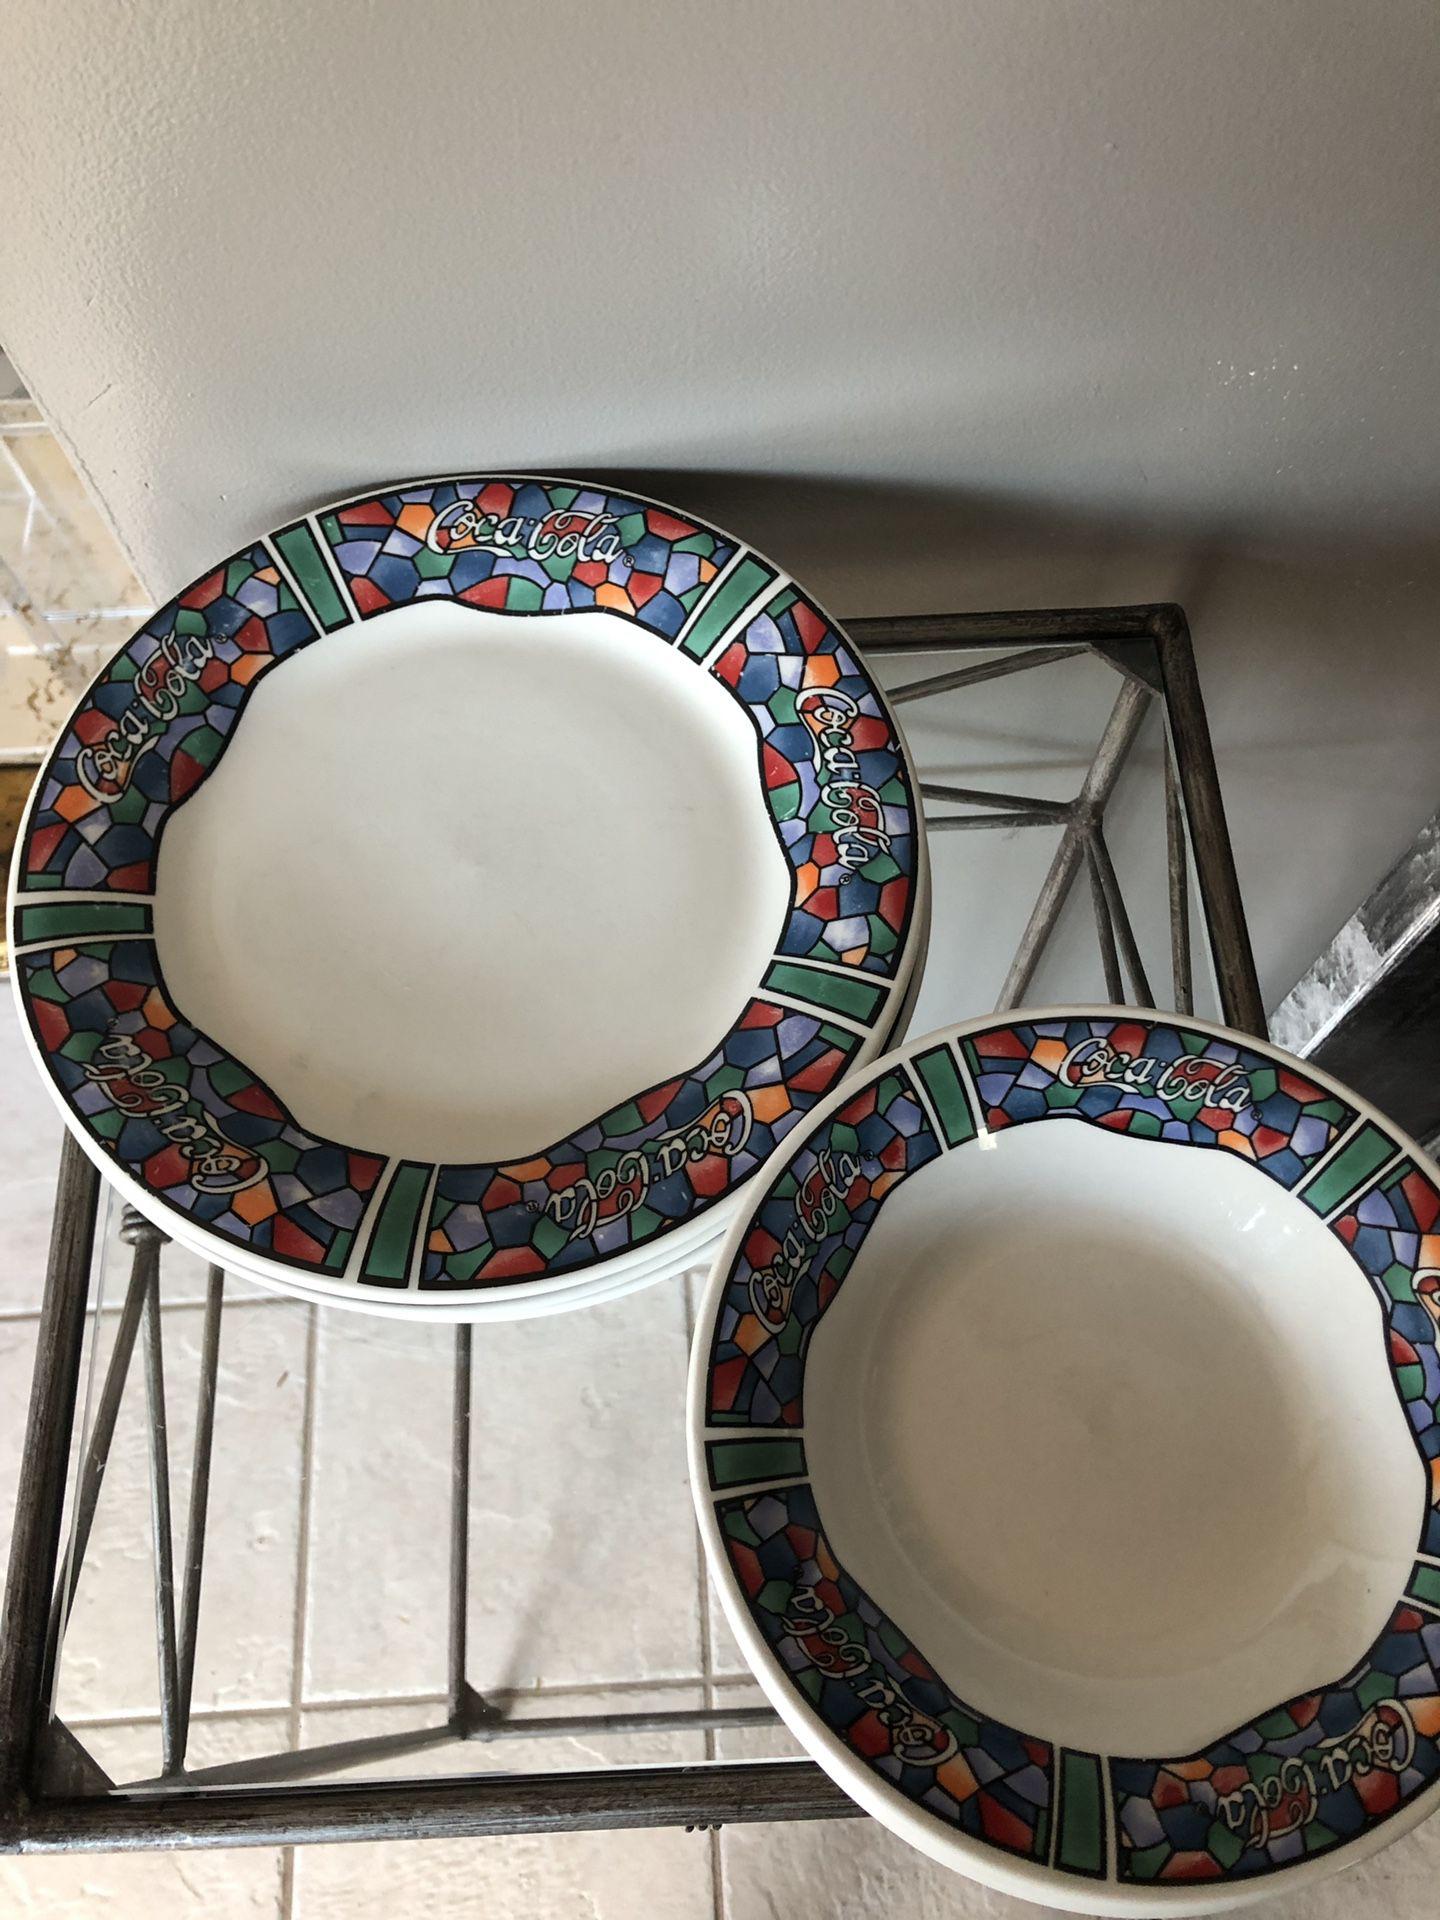 Coca Cola plates